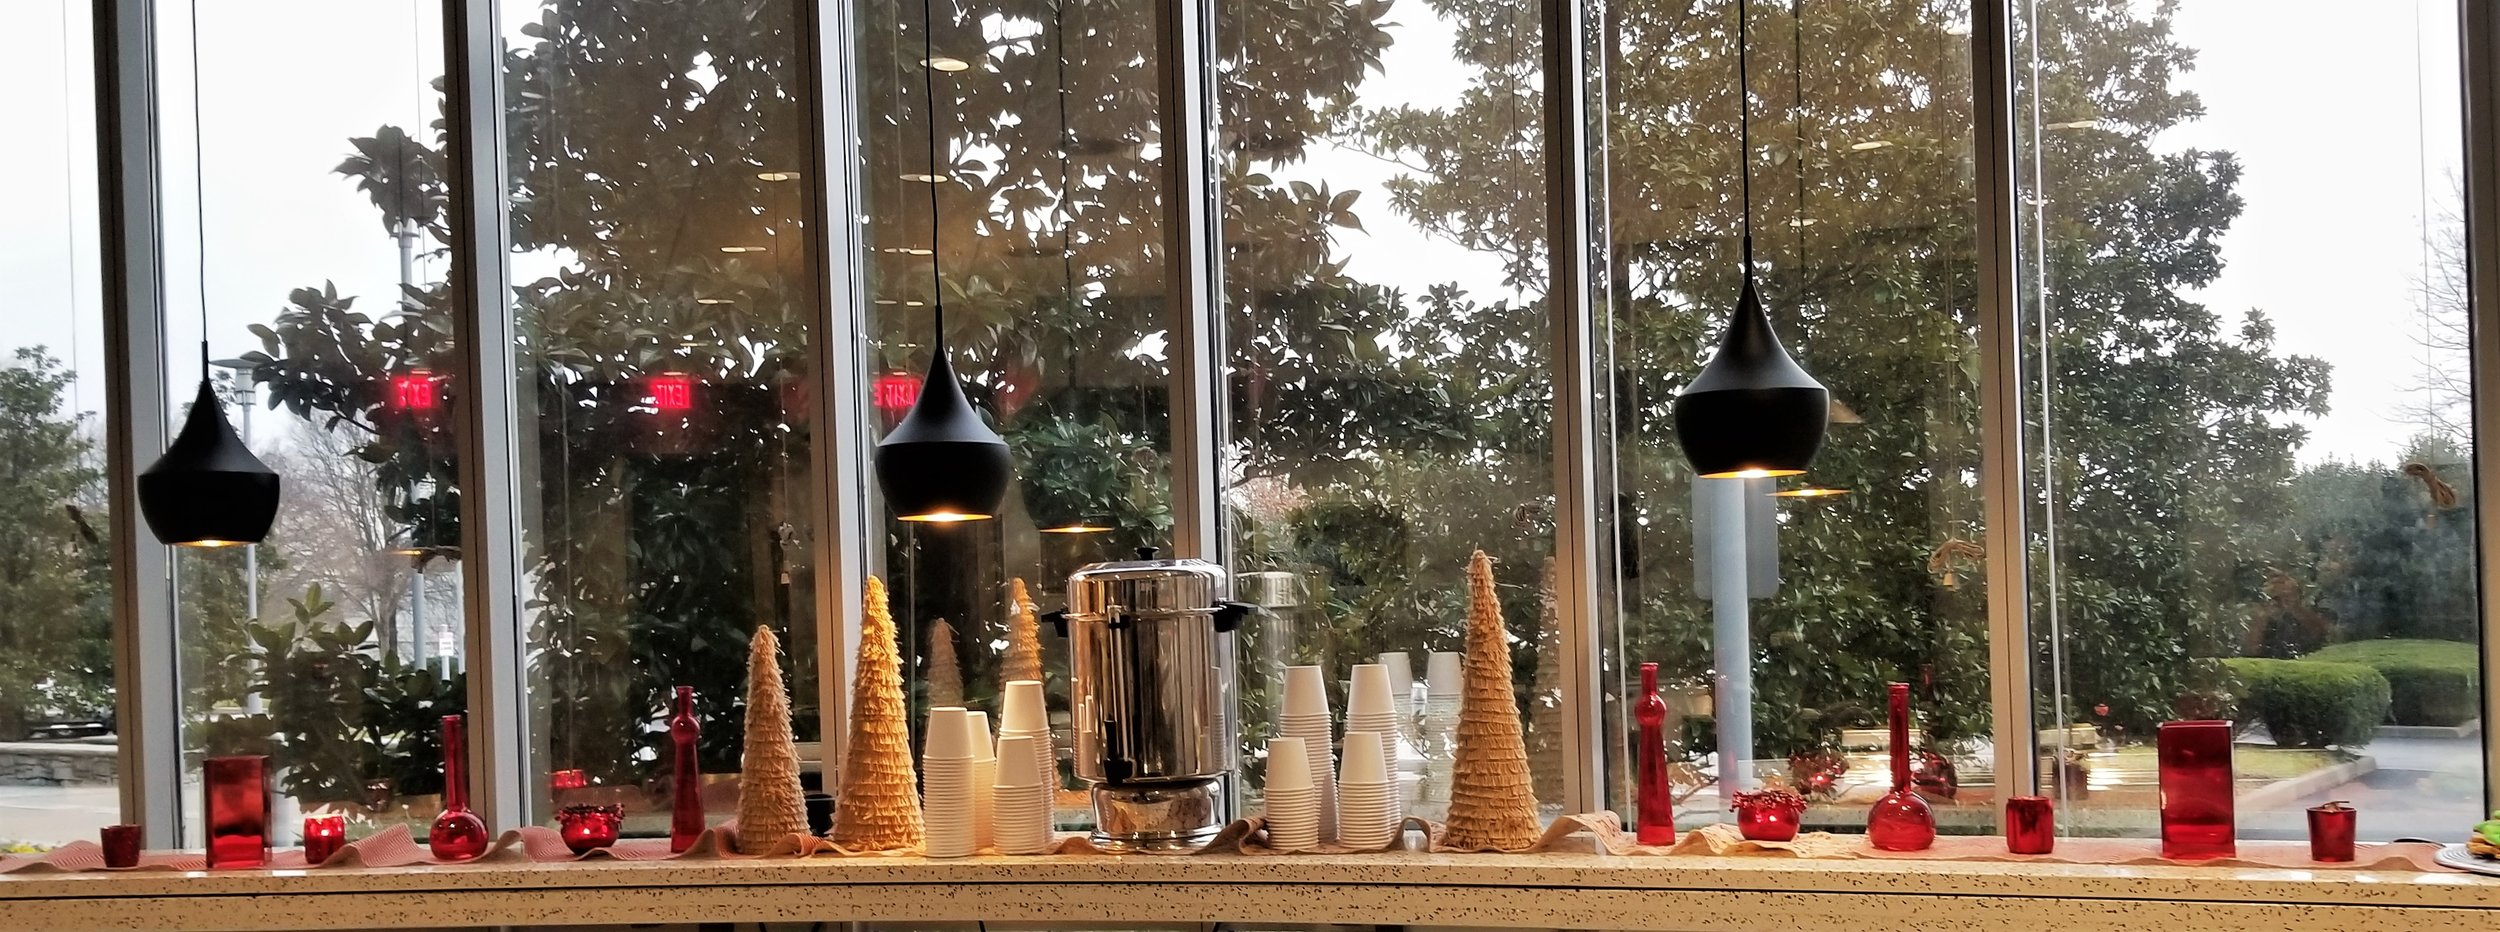 Holiday window.jpg